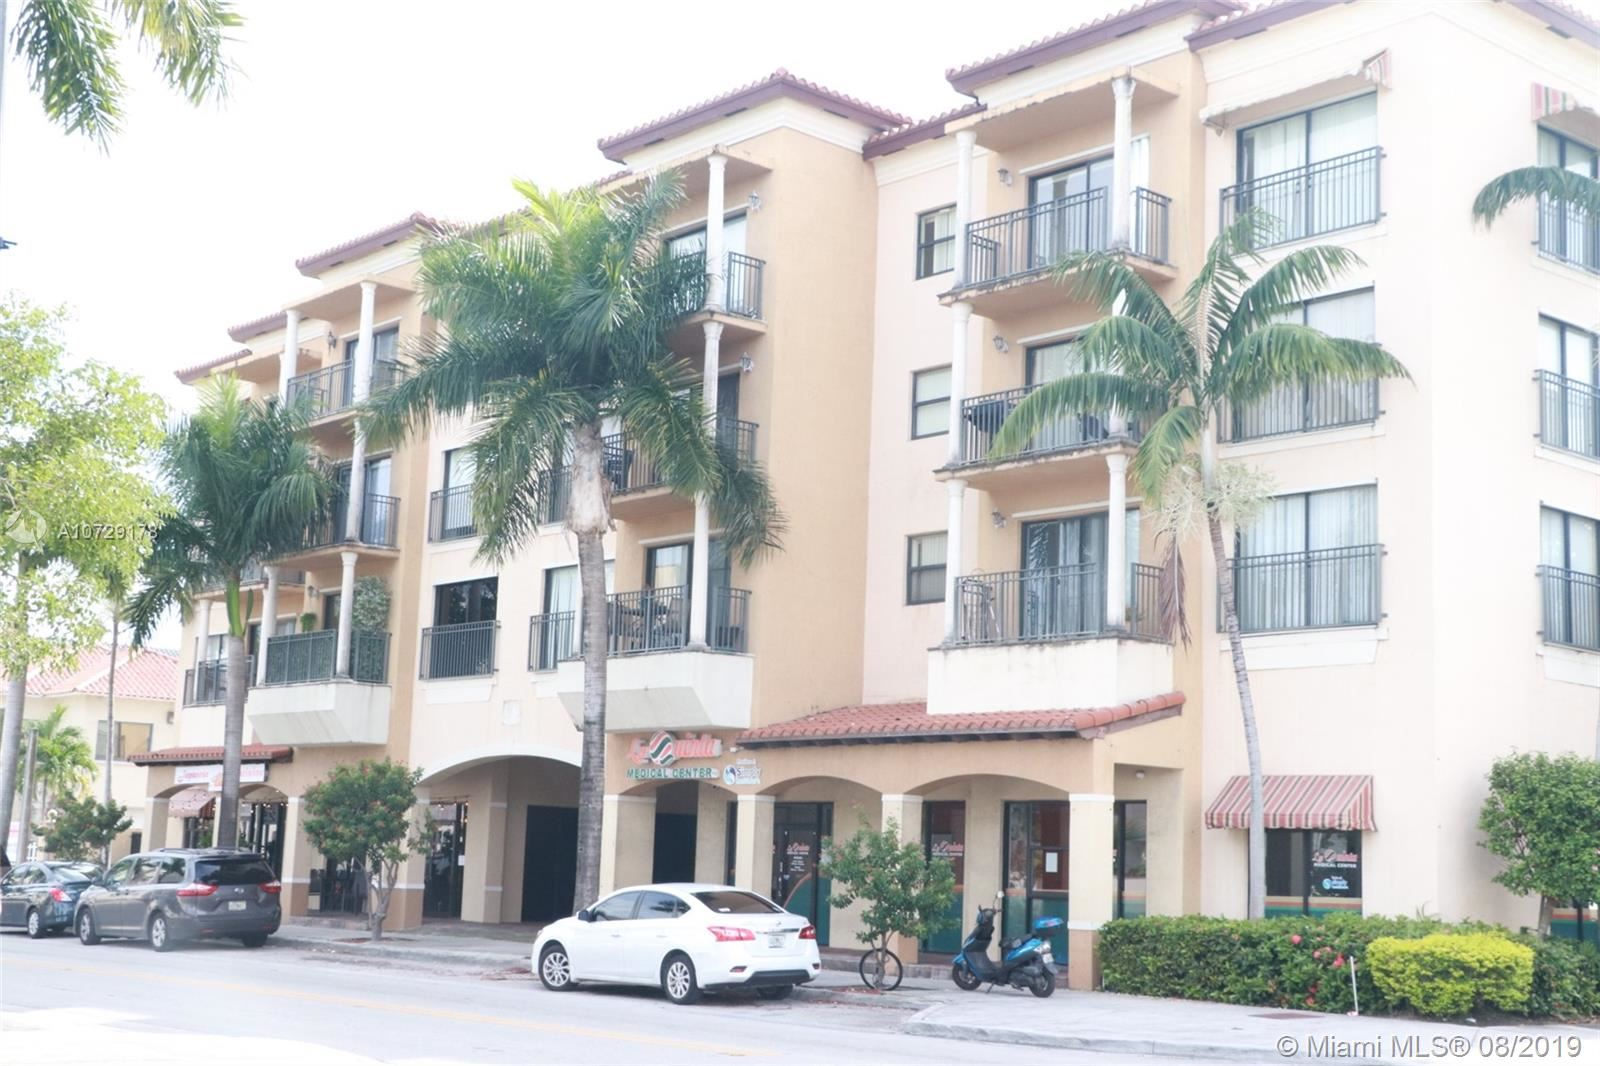 650 Palm AVE #205, Hialeah, FL 33010 - MLS#: A10729178